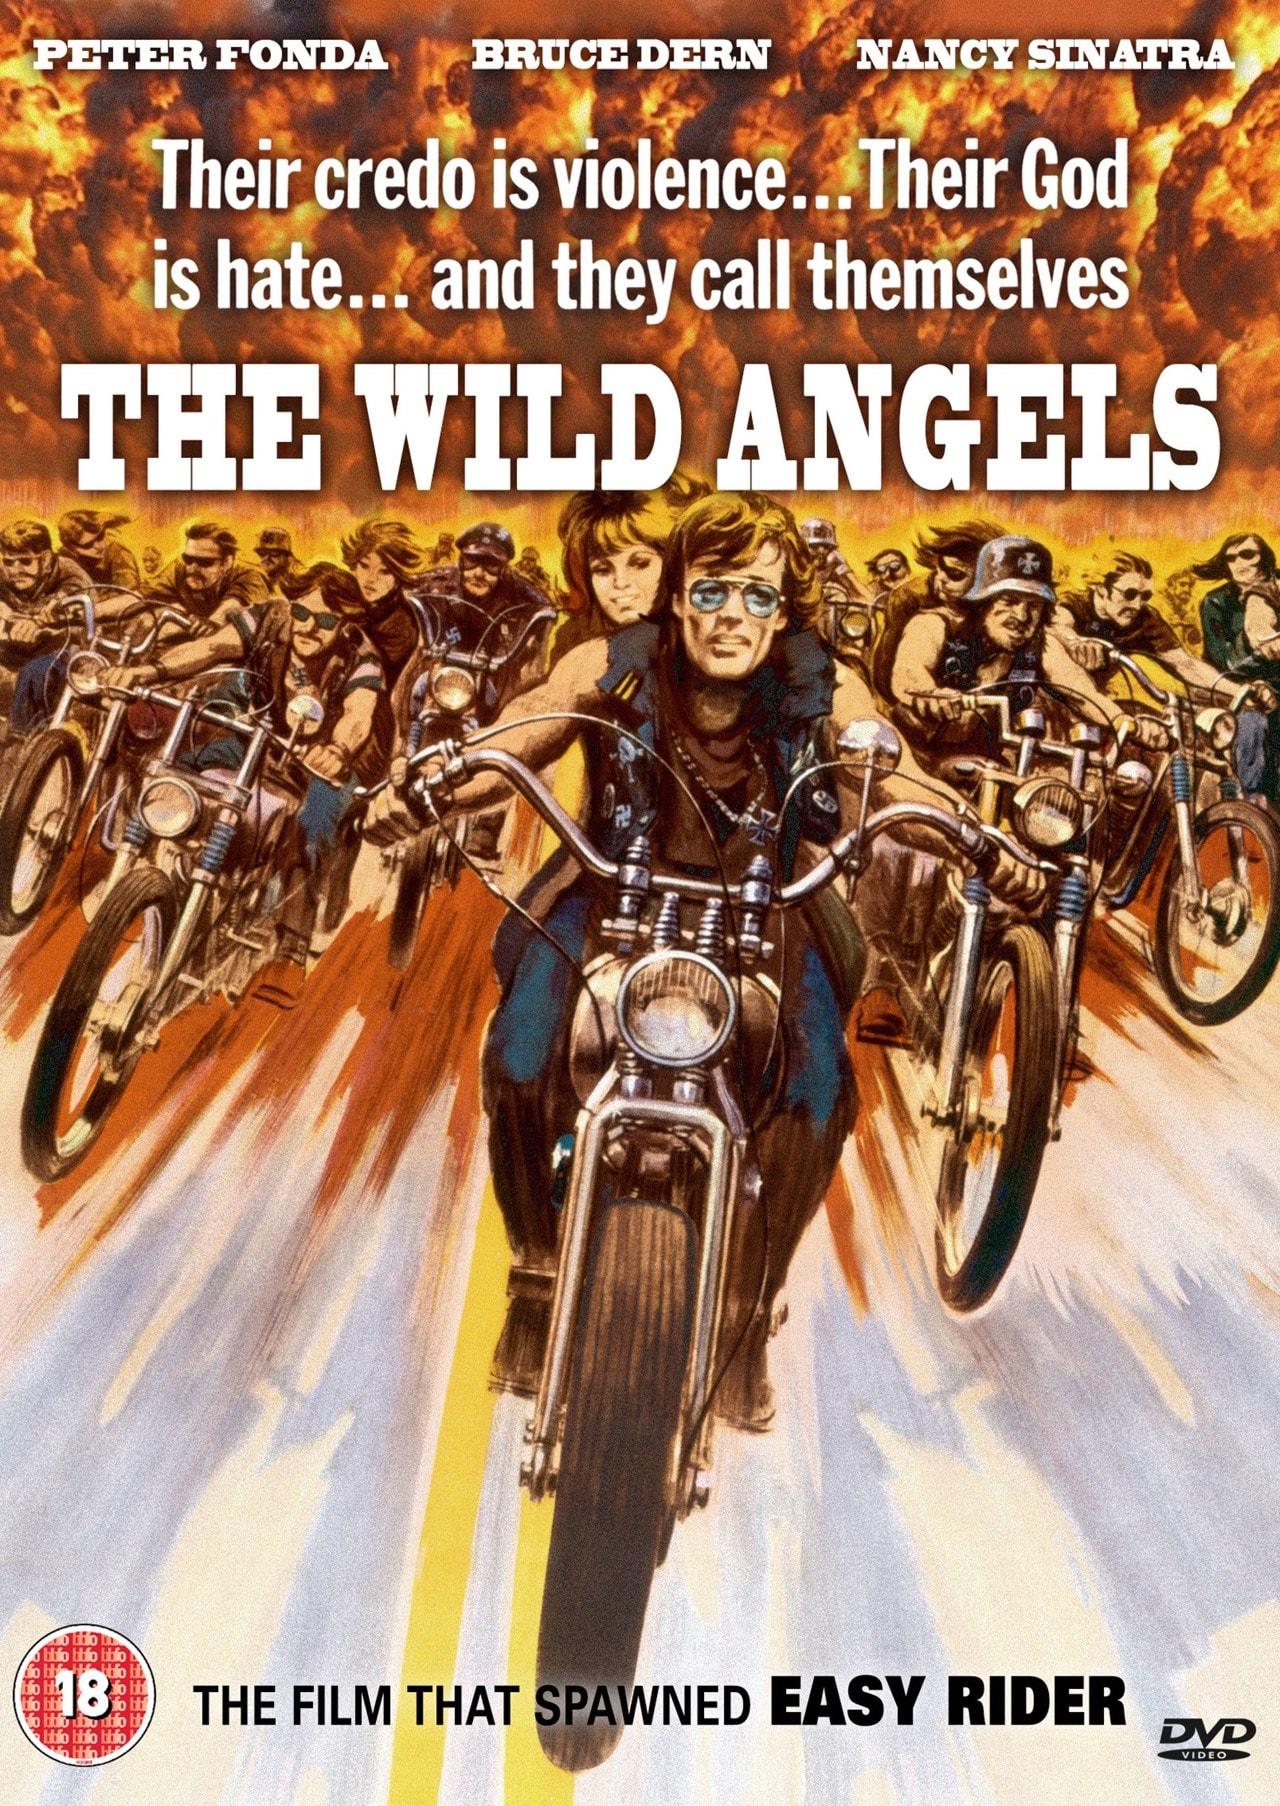 The Wild Angels - 1